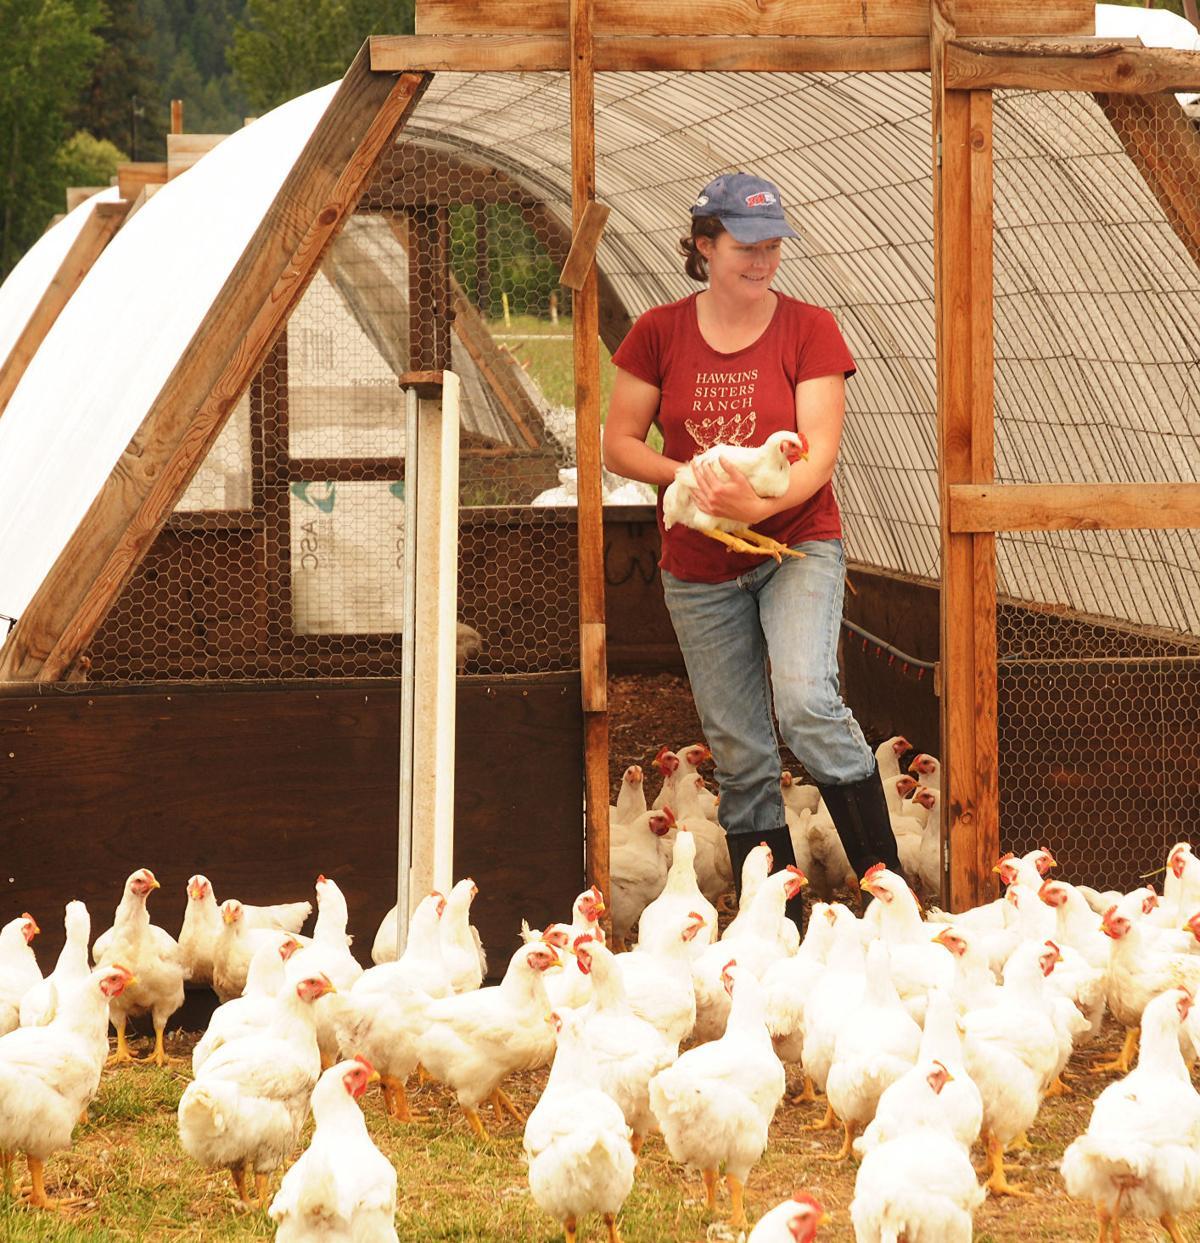 Hawkins sisters fine with fowl